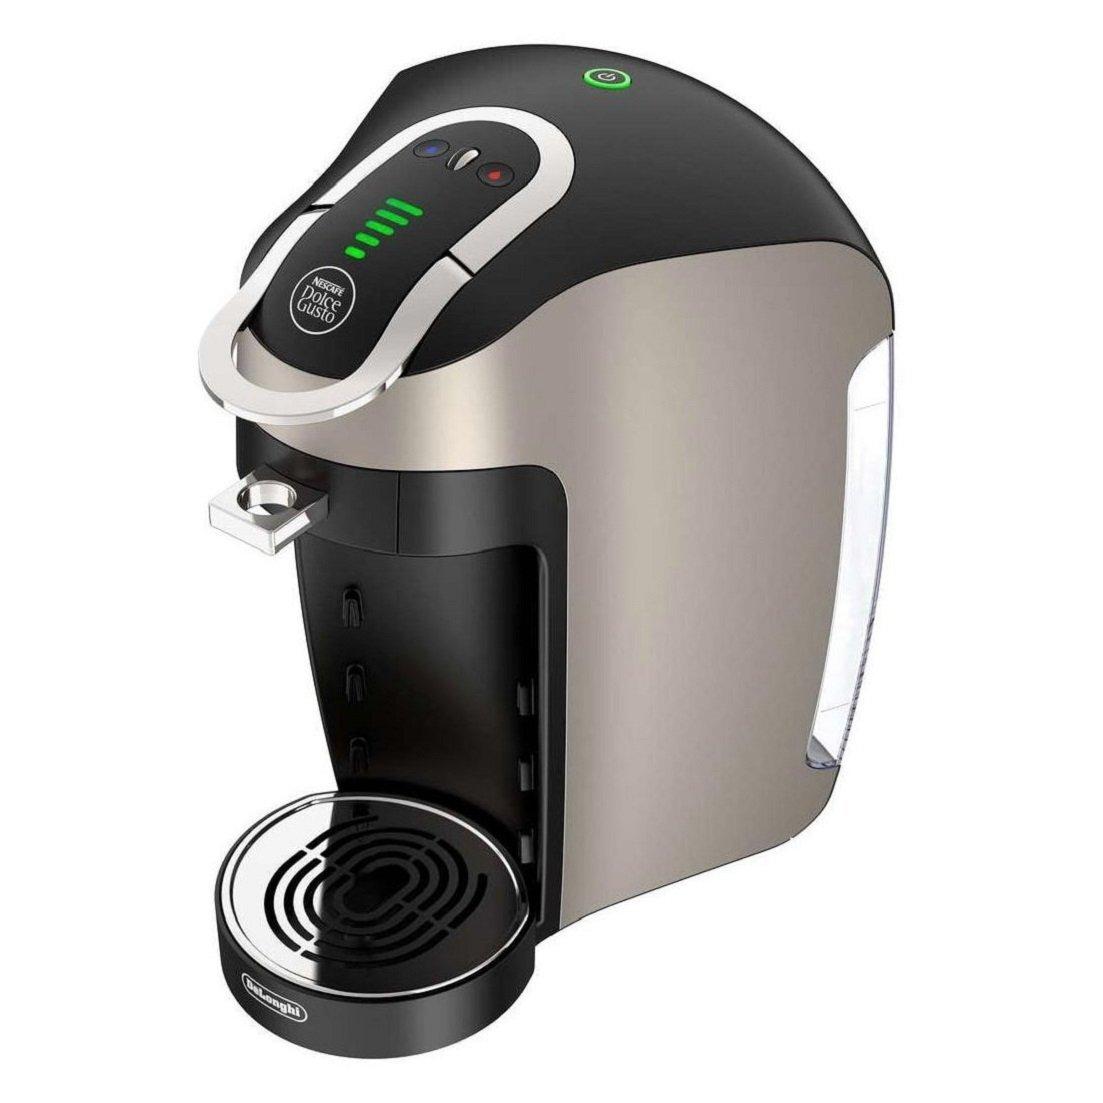 De'Longhi NESCAFÉ Dolce Gusto Esperta Single Serve Coffee Maker and Espresso Machine - 60oz Capacity – Capsule Based